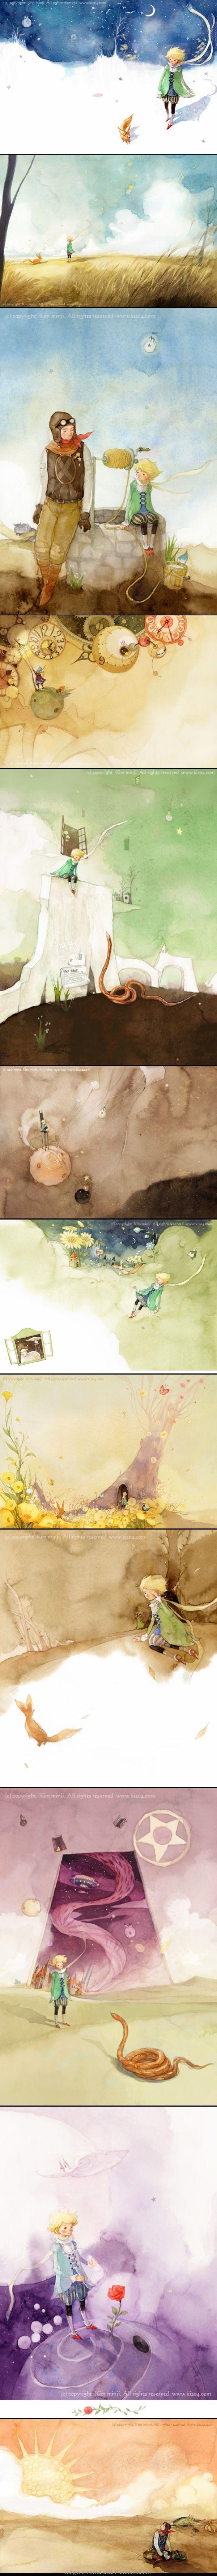 Kim Min Ji's enchanting illustrations of Antoine de Saint-Exupéry's The Little Prince